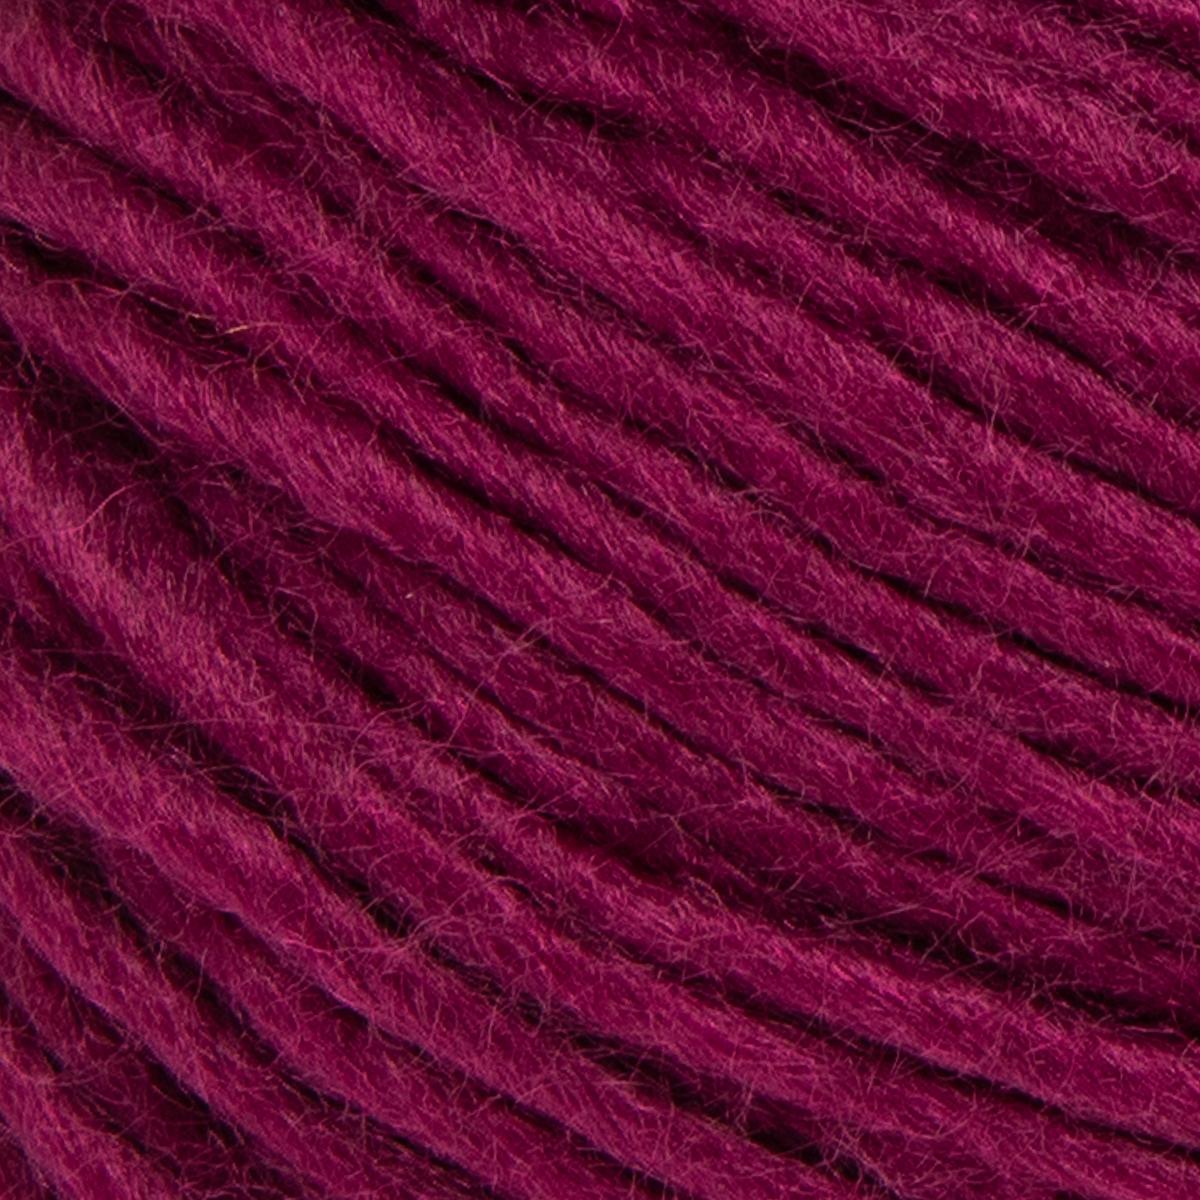 3pk-Lion-Brand-Yarn-Landscapes-Acrylic-100-Medium-4-Soft-Knitting-Crocheting thumbnail 15